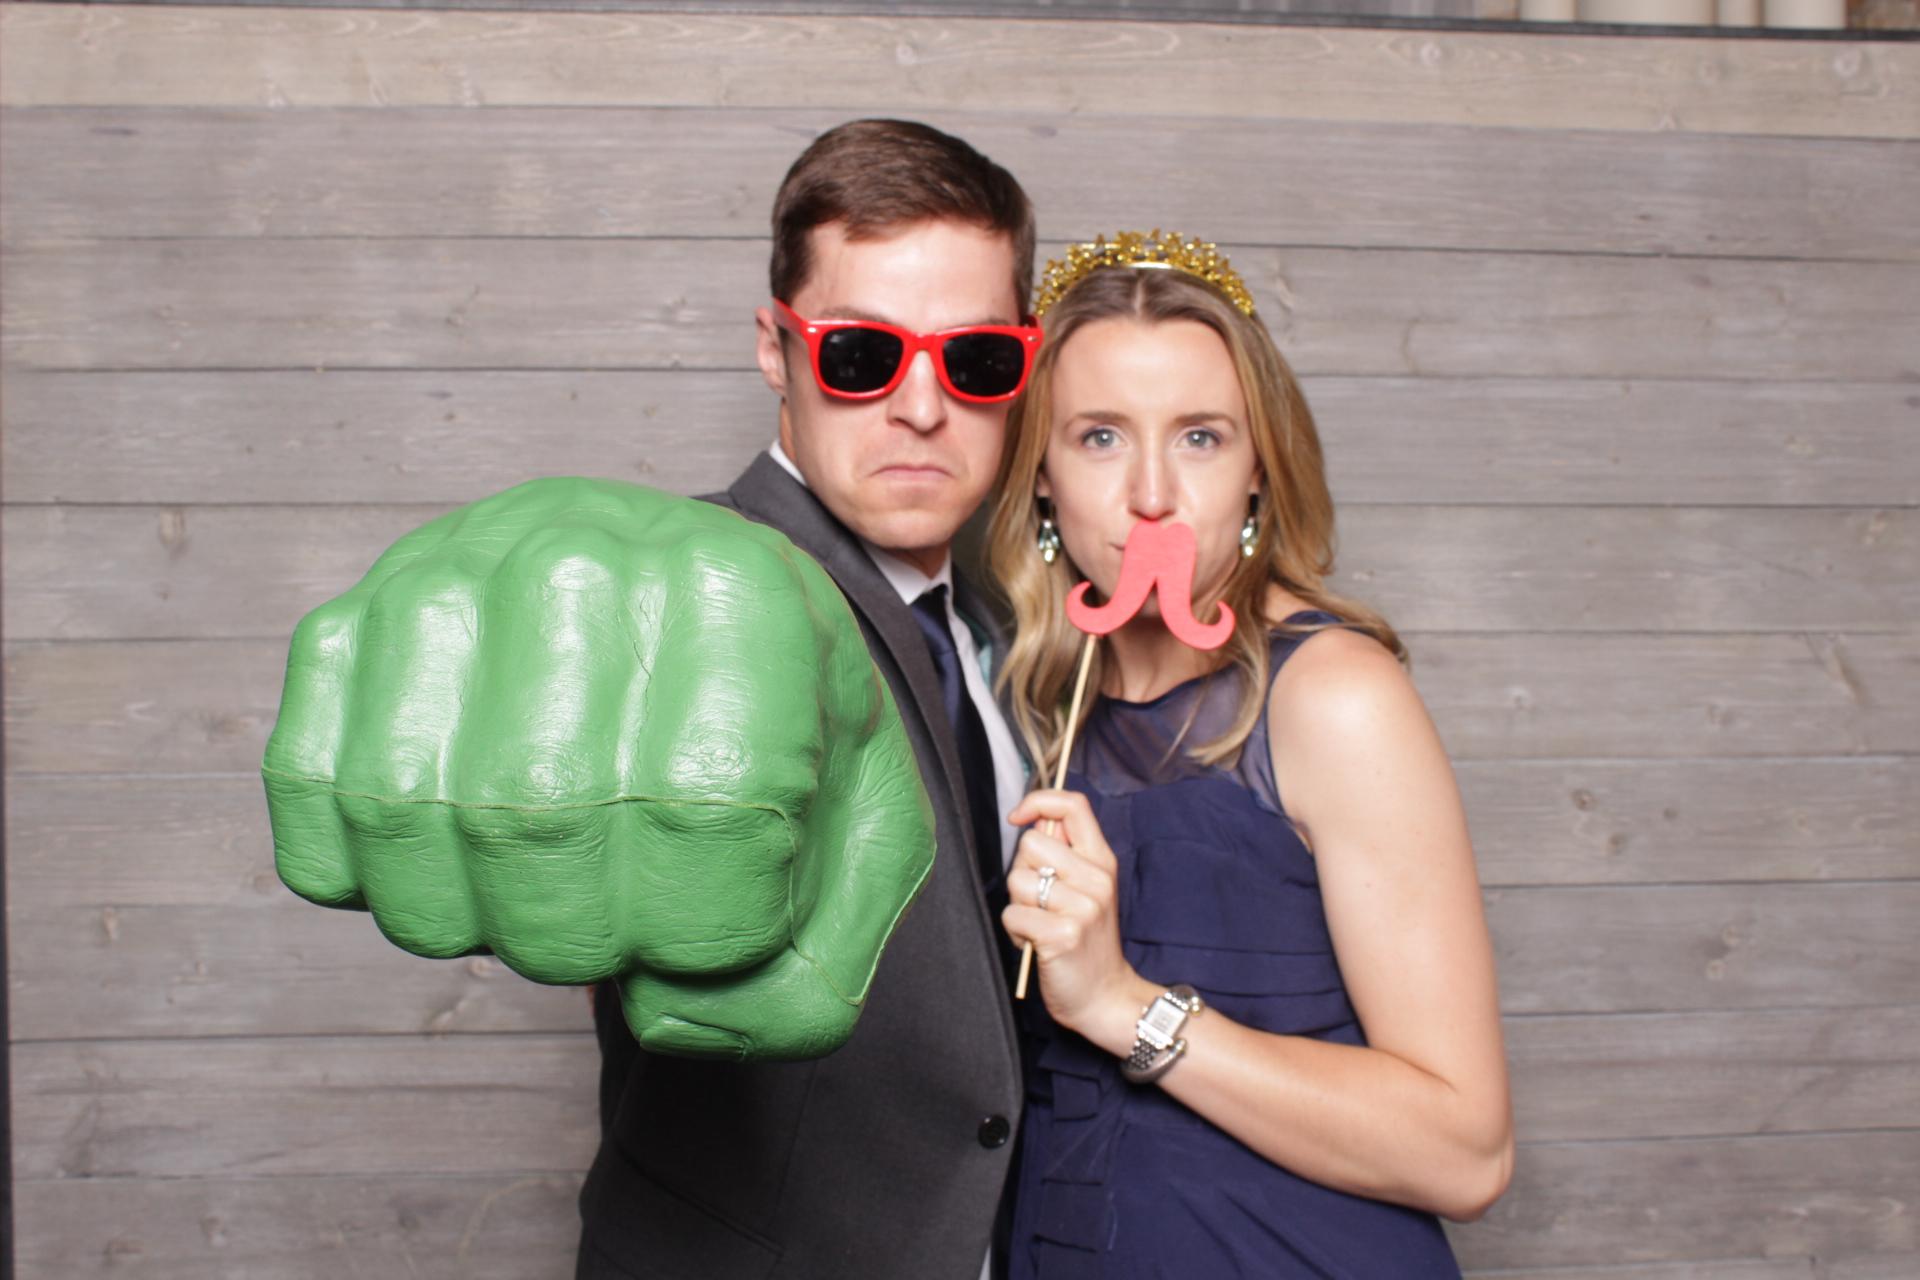 Minneapolis_Machine_Shop_wedding_photo_booth_rental (15).jpg